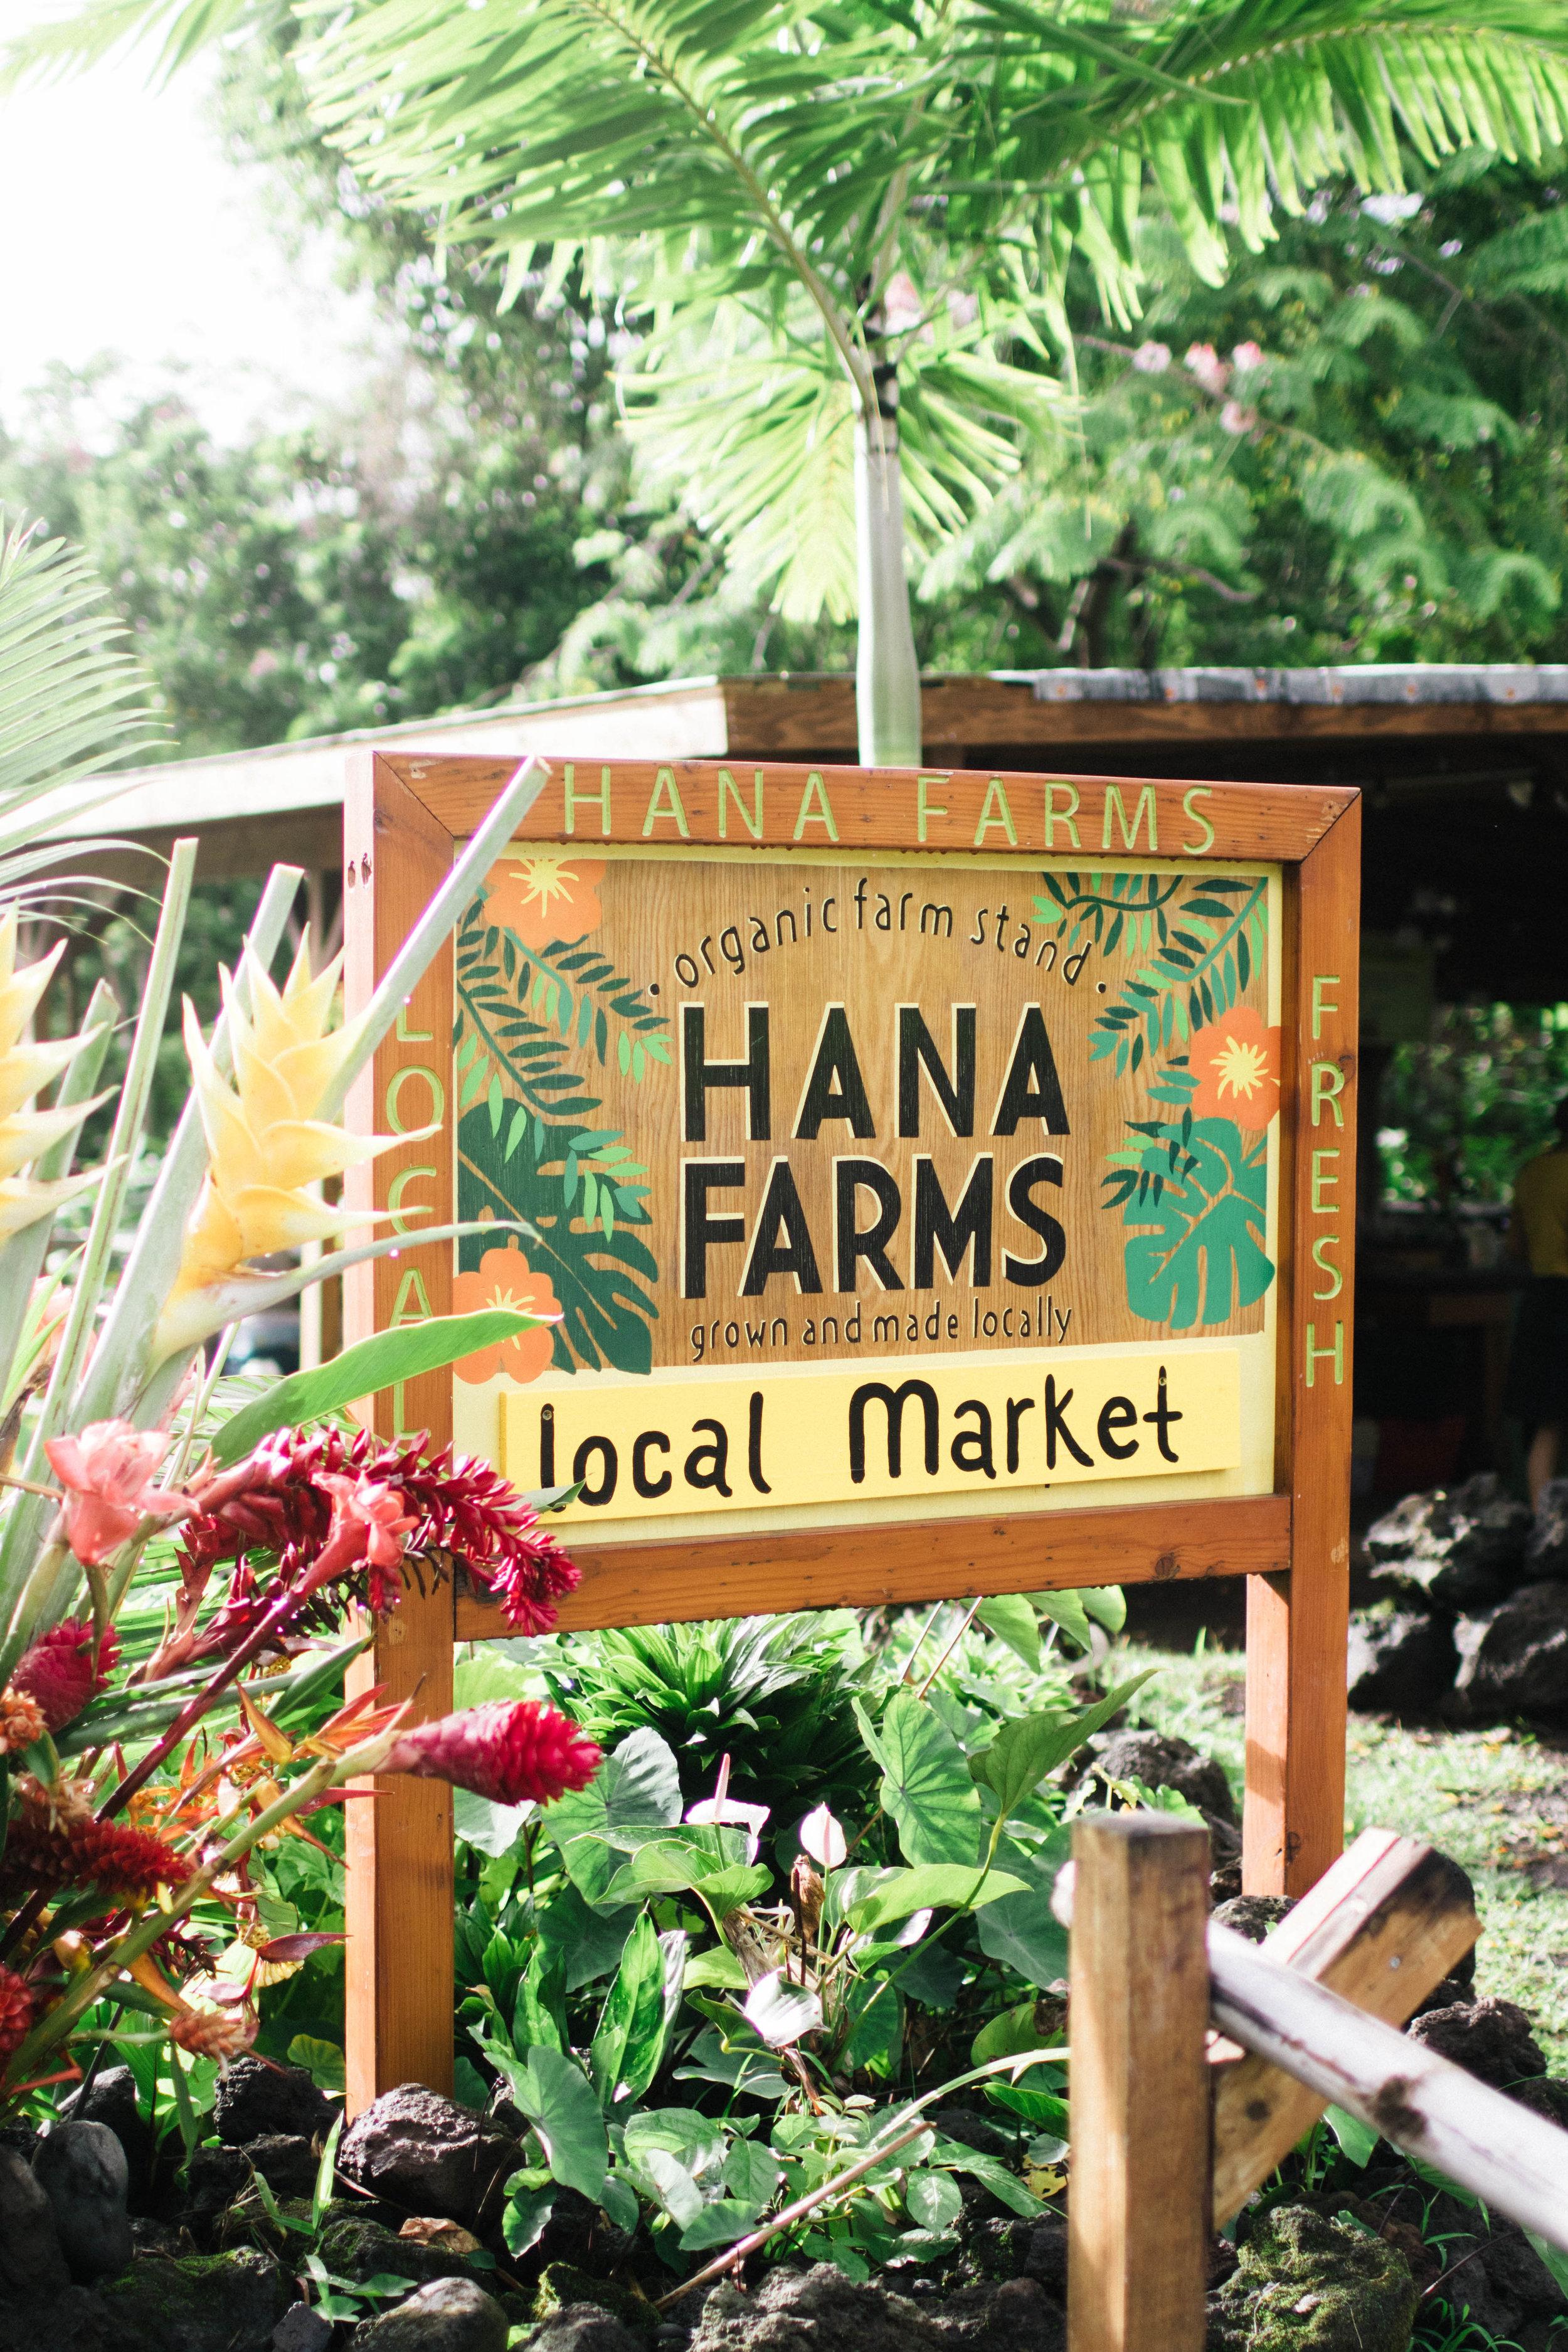 hana-farms-maui-photo-by-samantha-look.jpg